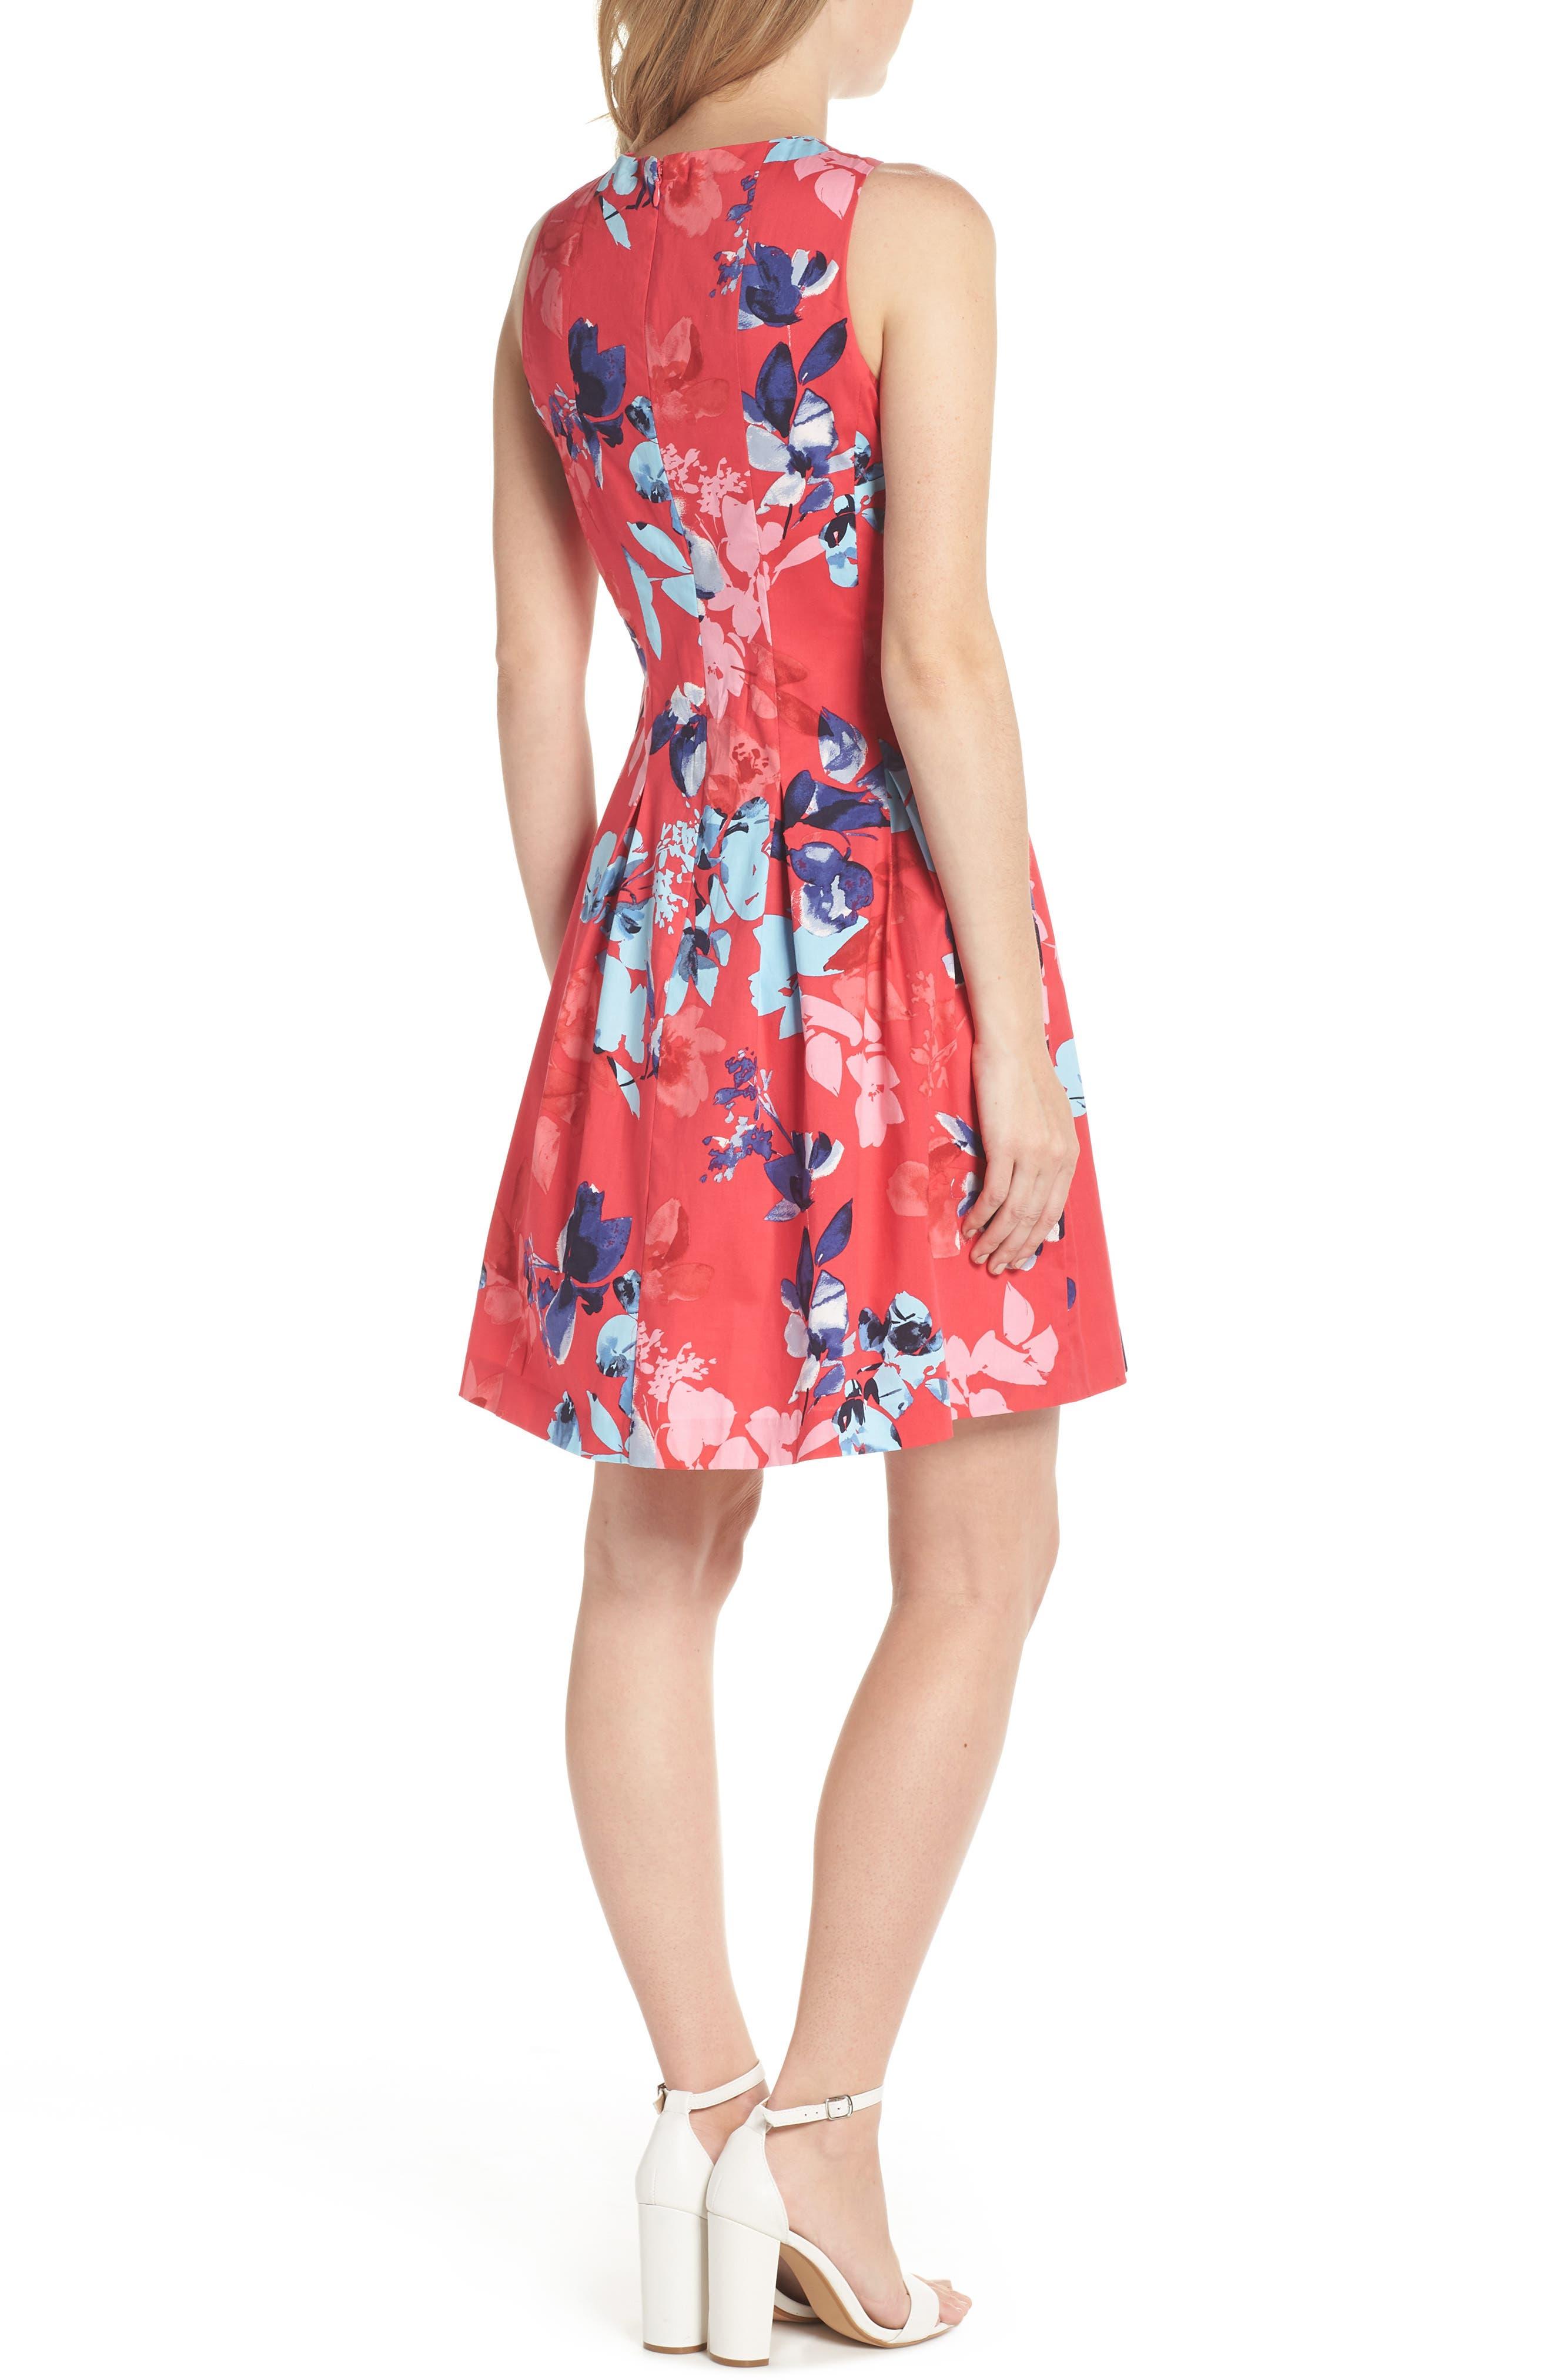 VINCE CAMUTO,                             Floral Cotton Fit & Flare Dress,                             Alternate thumbnail 2, color,                             653